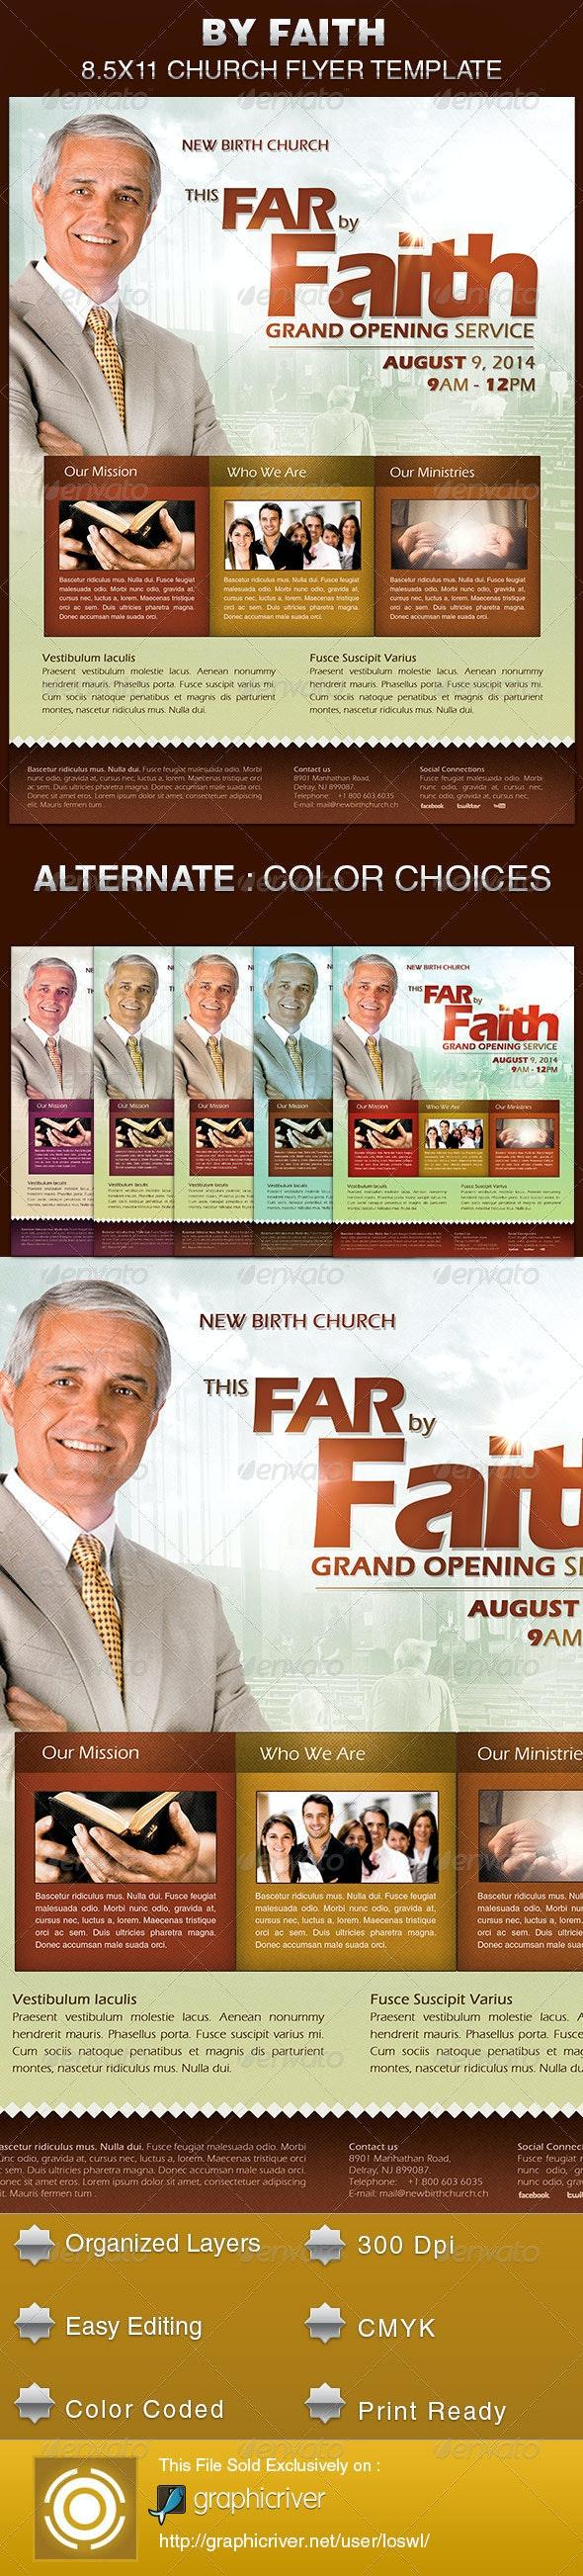 By Faith Church Grand Opening Flyer Template - Church Flyers